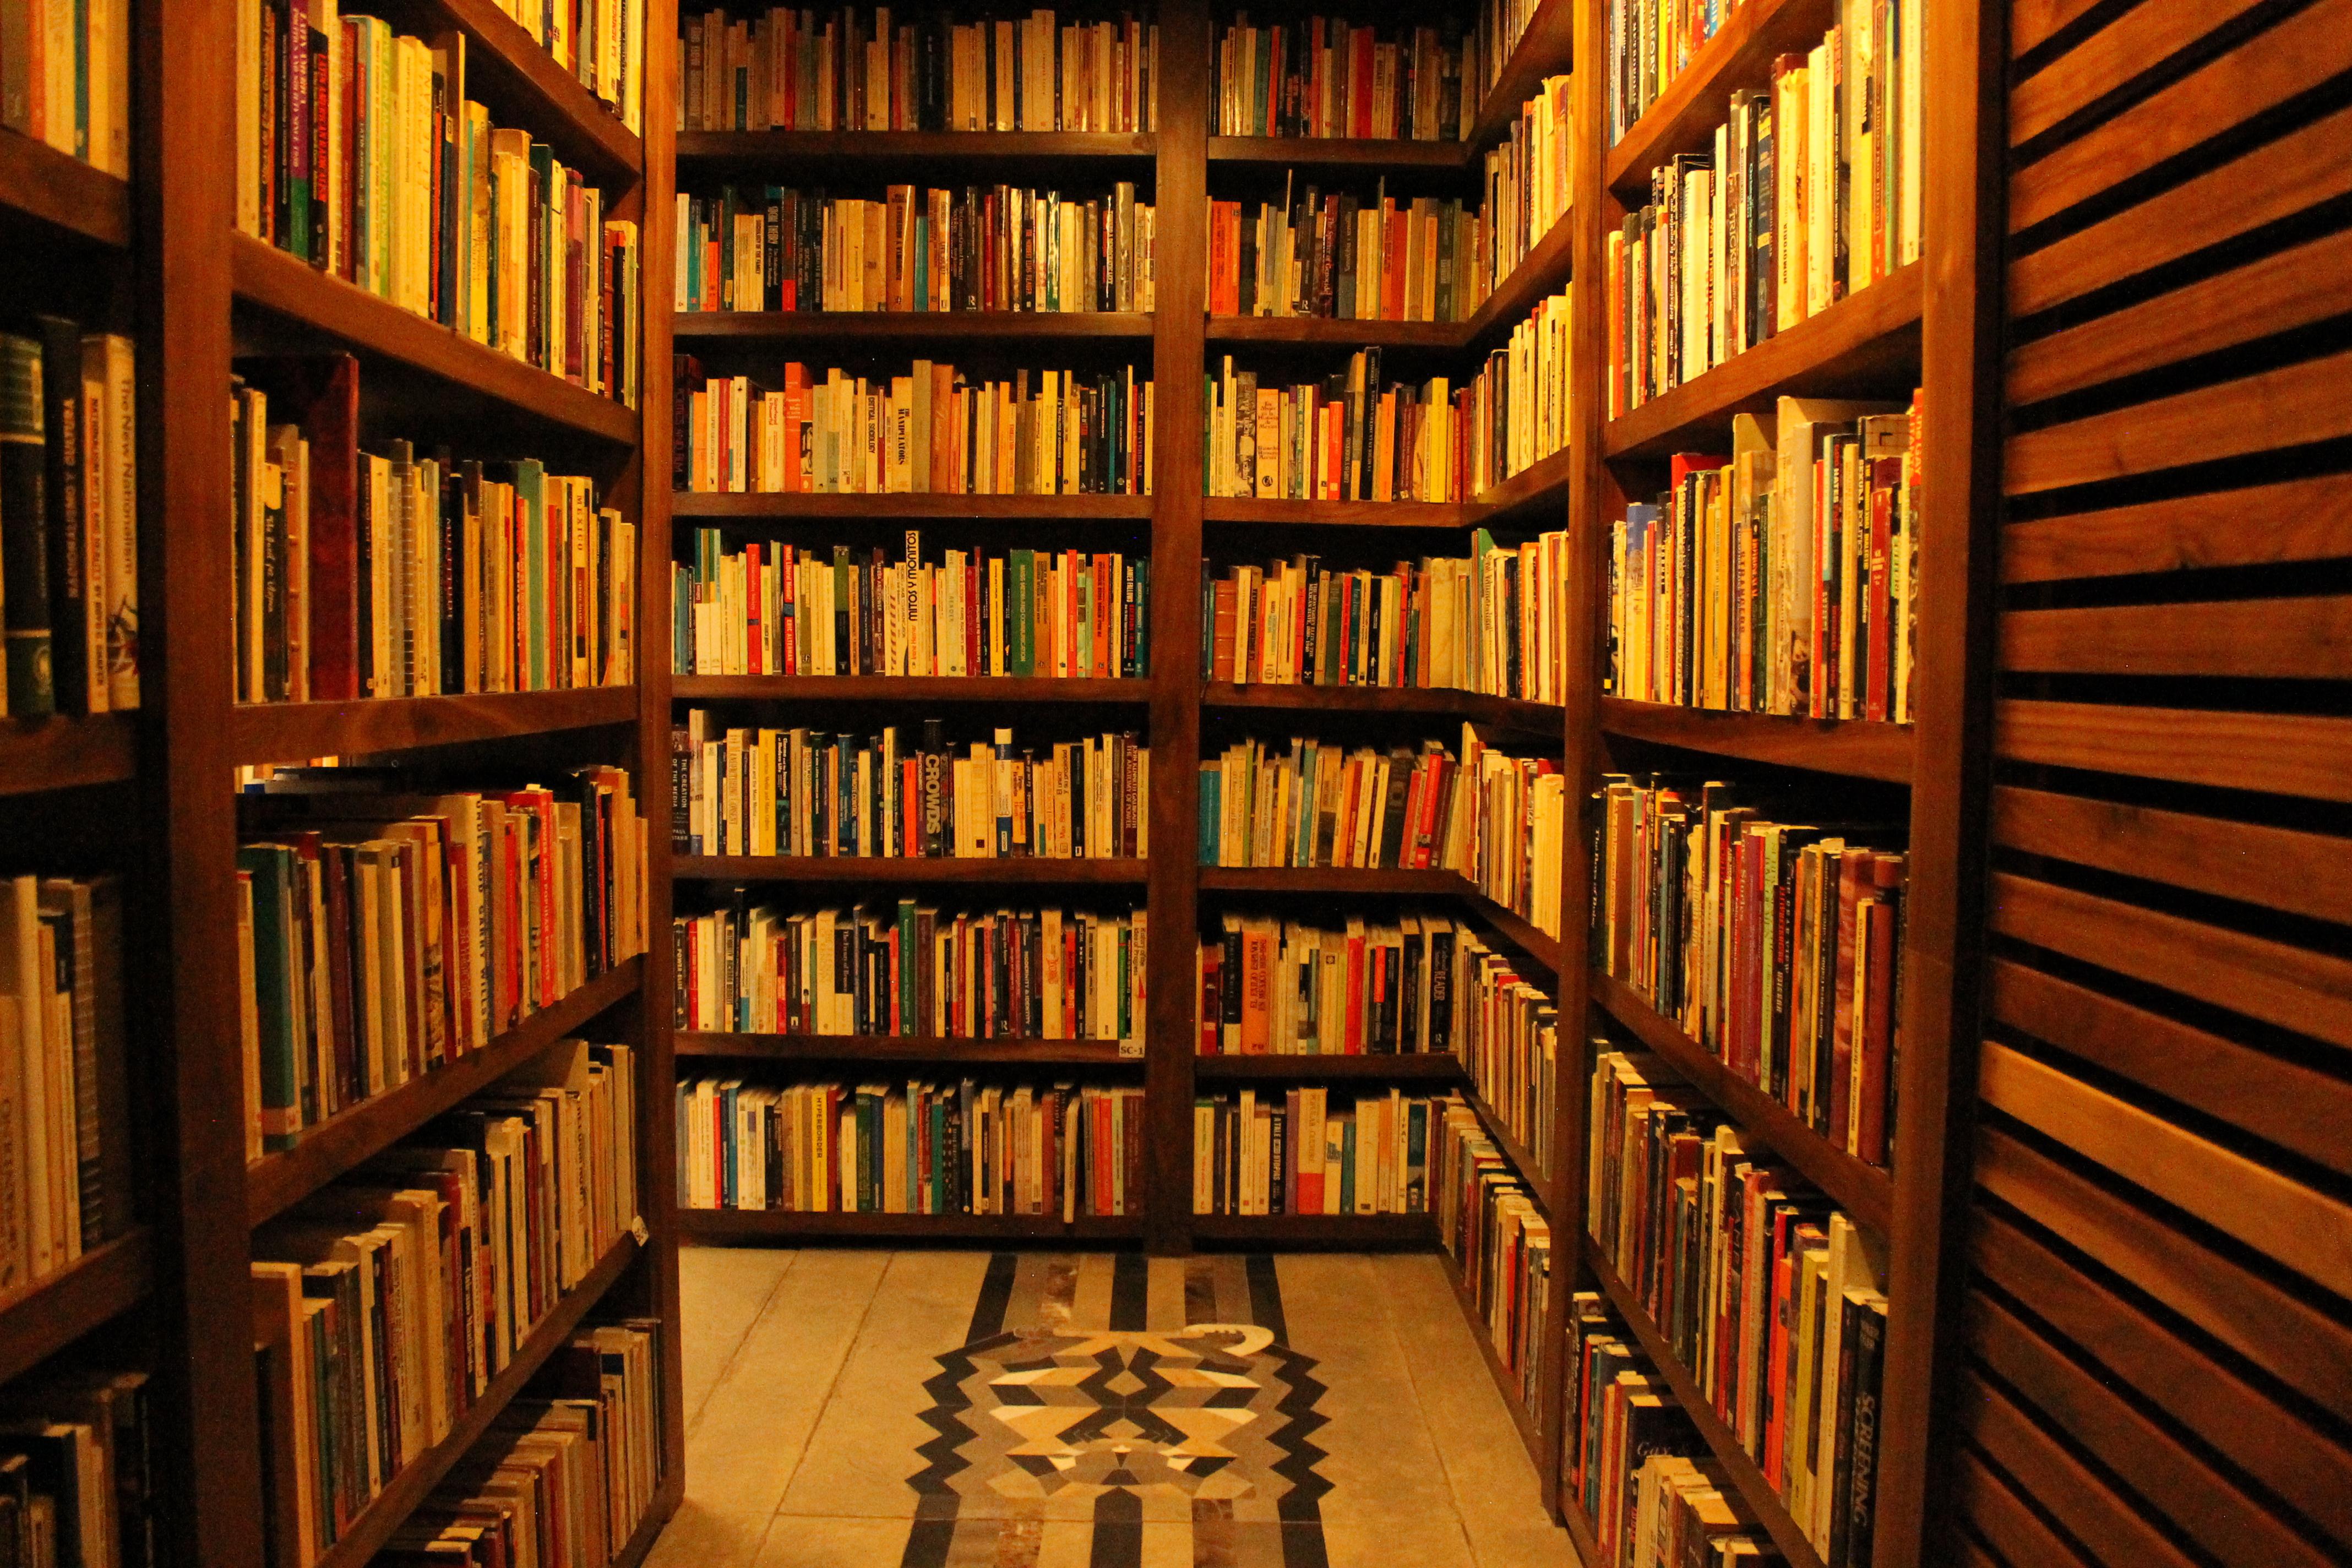 La biblioteca de Monsiváis es un caótico homenaje a la CDMX